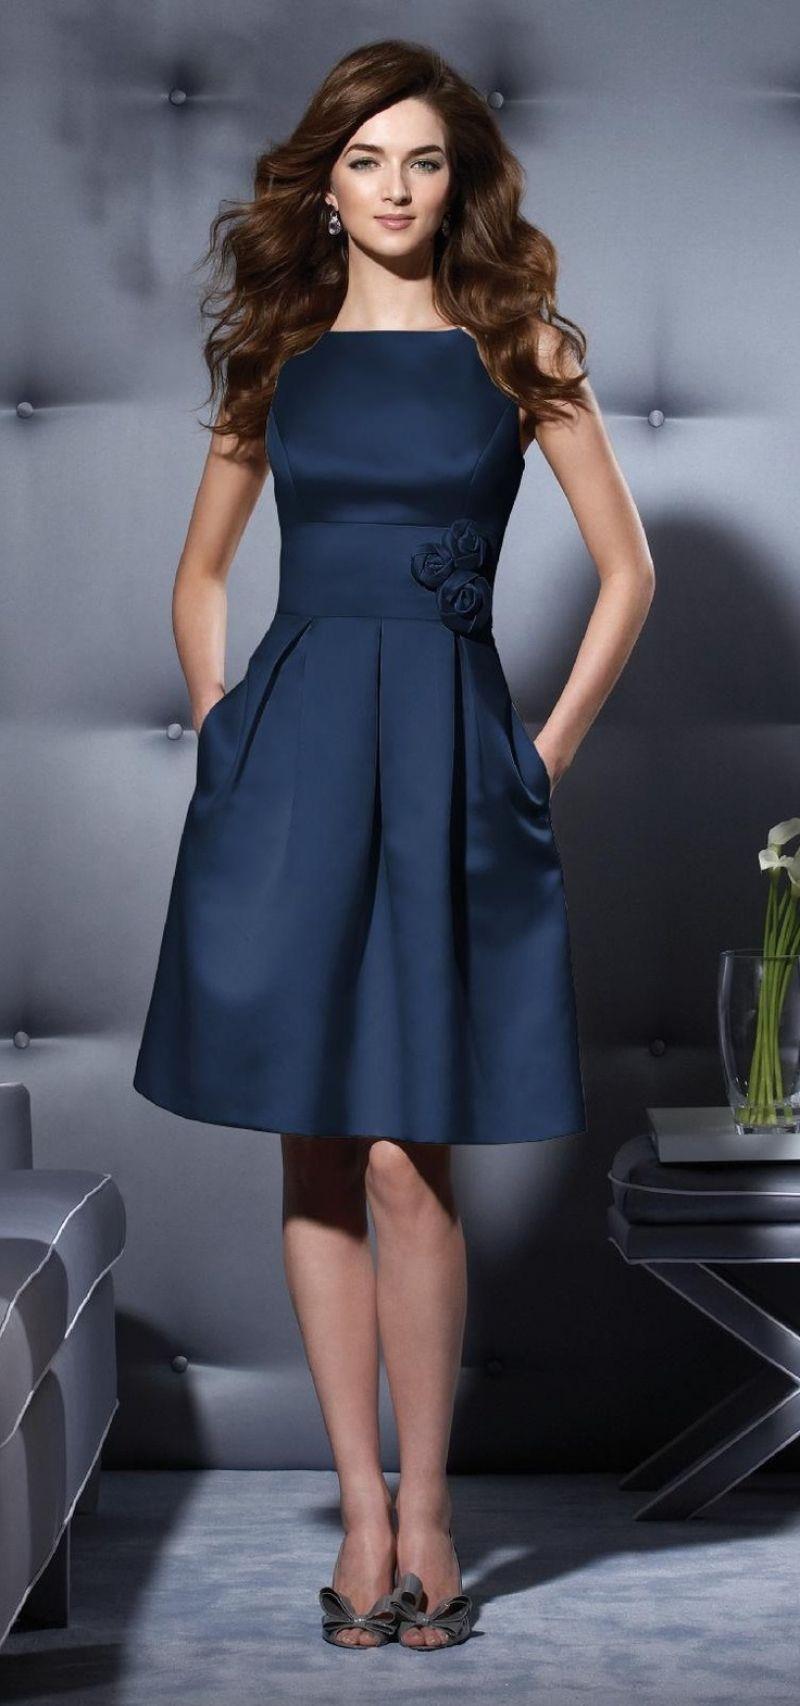 17 Ideas de Vestidos de color Azul que te encantarán ! - Vestidos ...